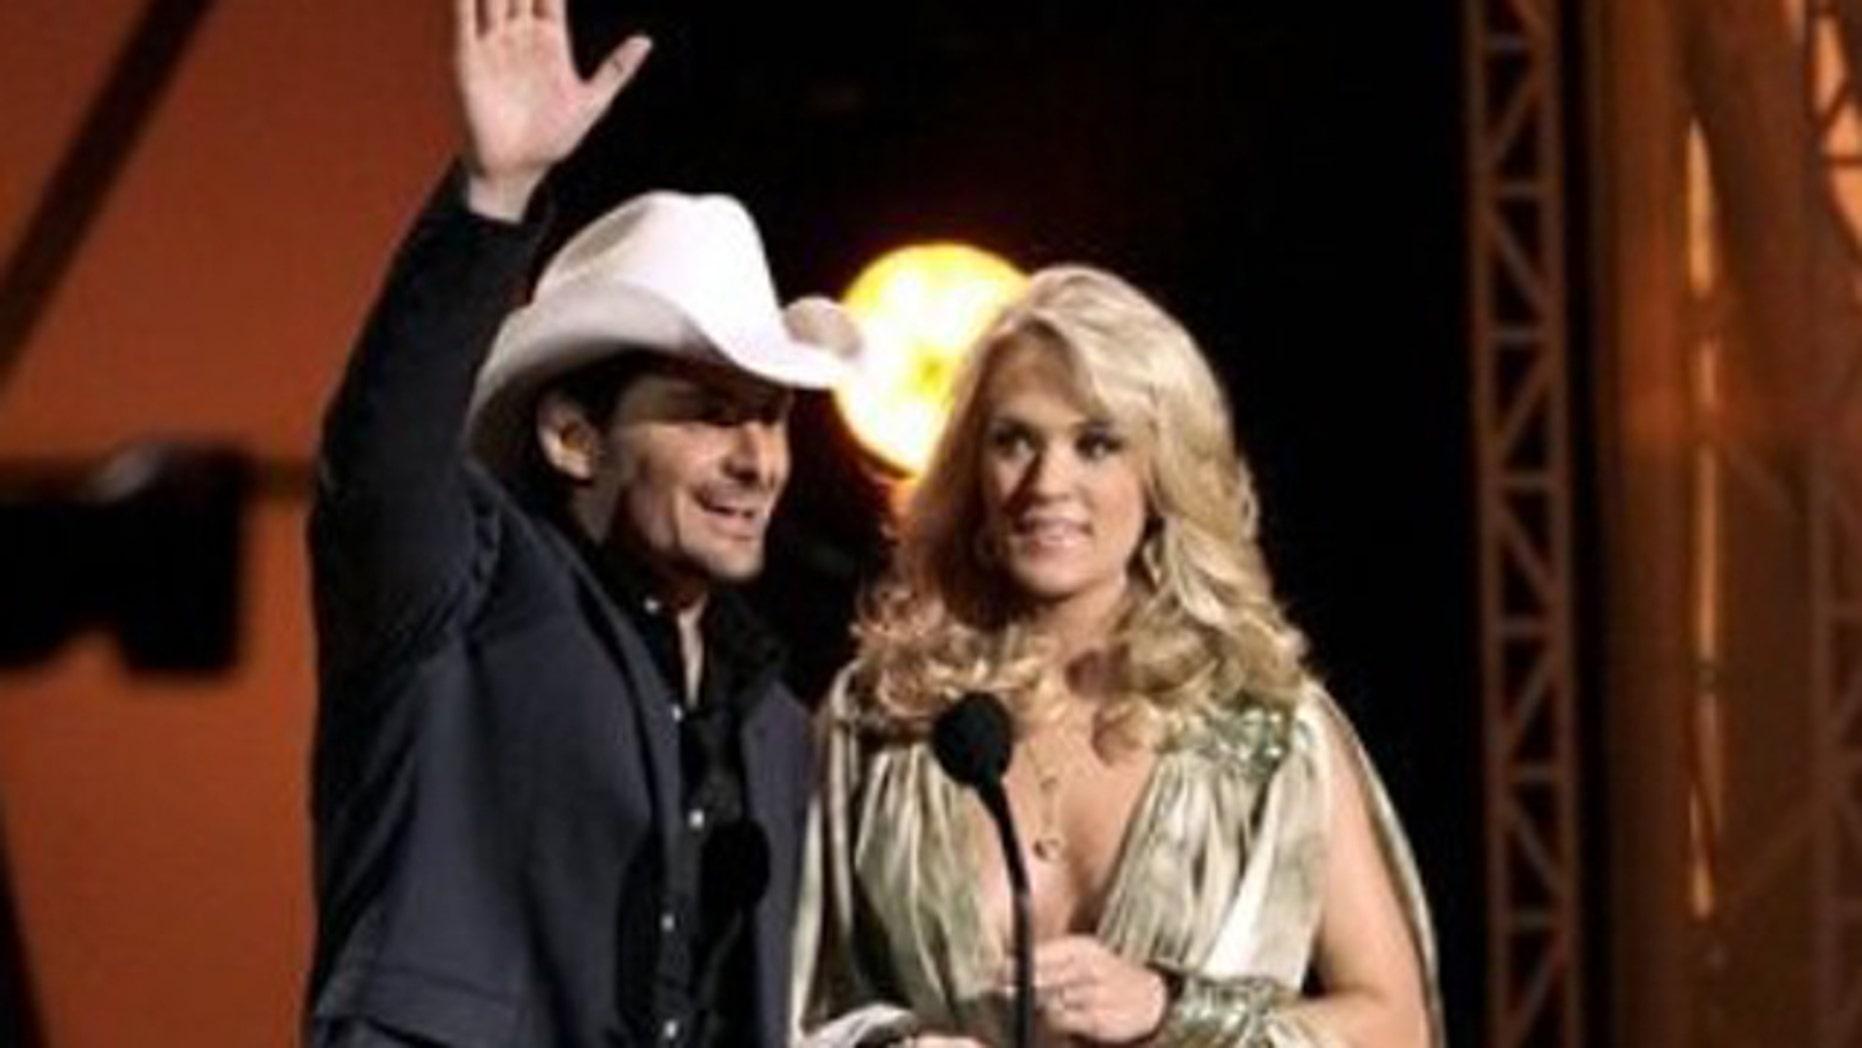 Nov. 9, 2011: Hosts Brad Paisley, left, and Carrie Underwood speak during the 45th Annual CMA Awards in Nashville, Tenn.